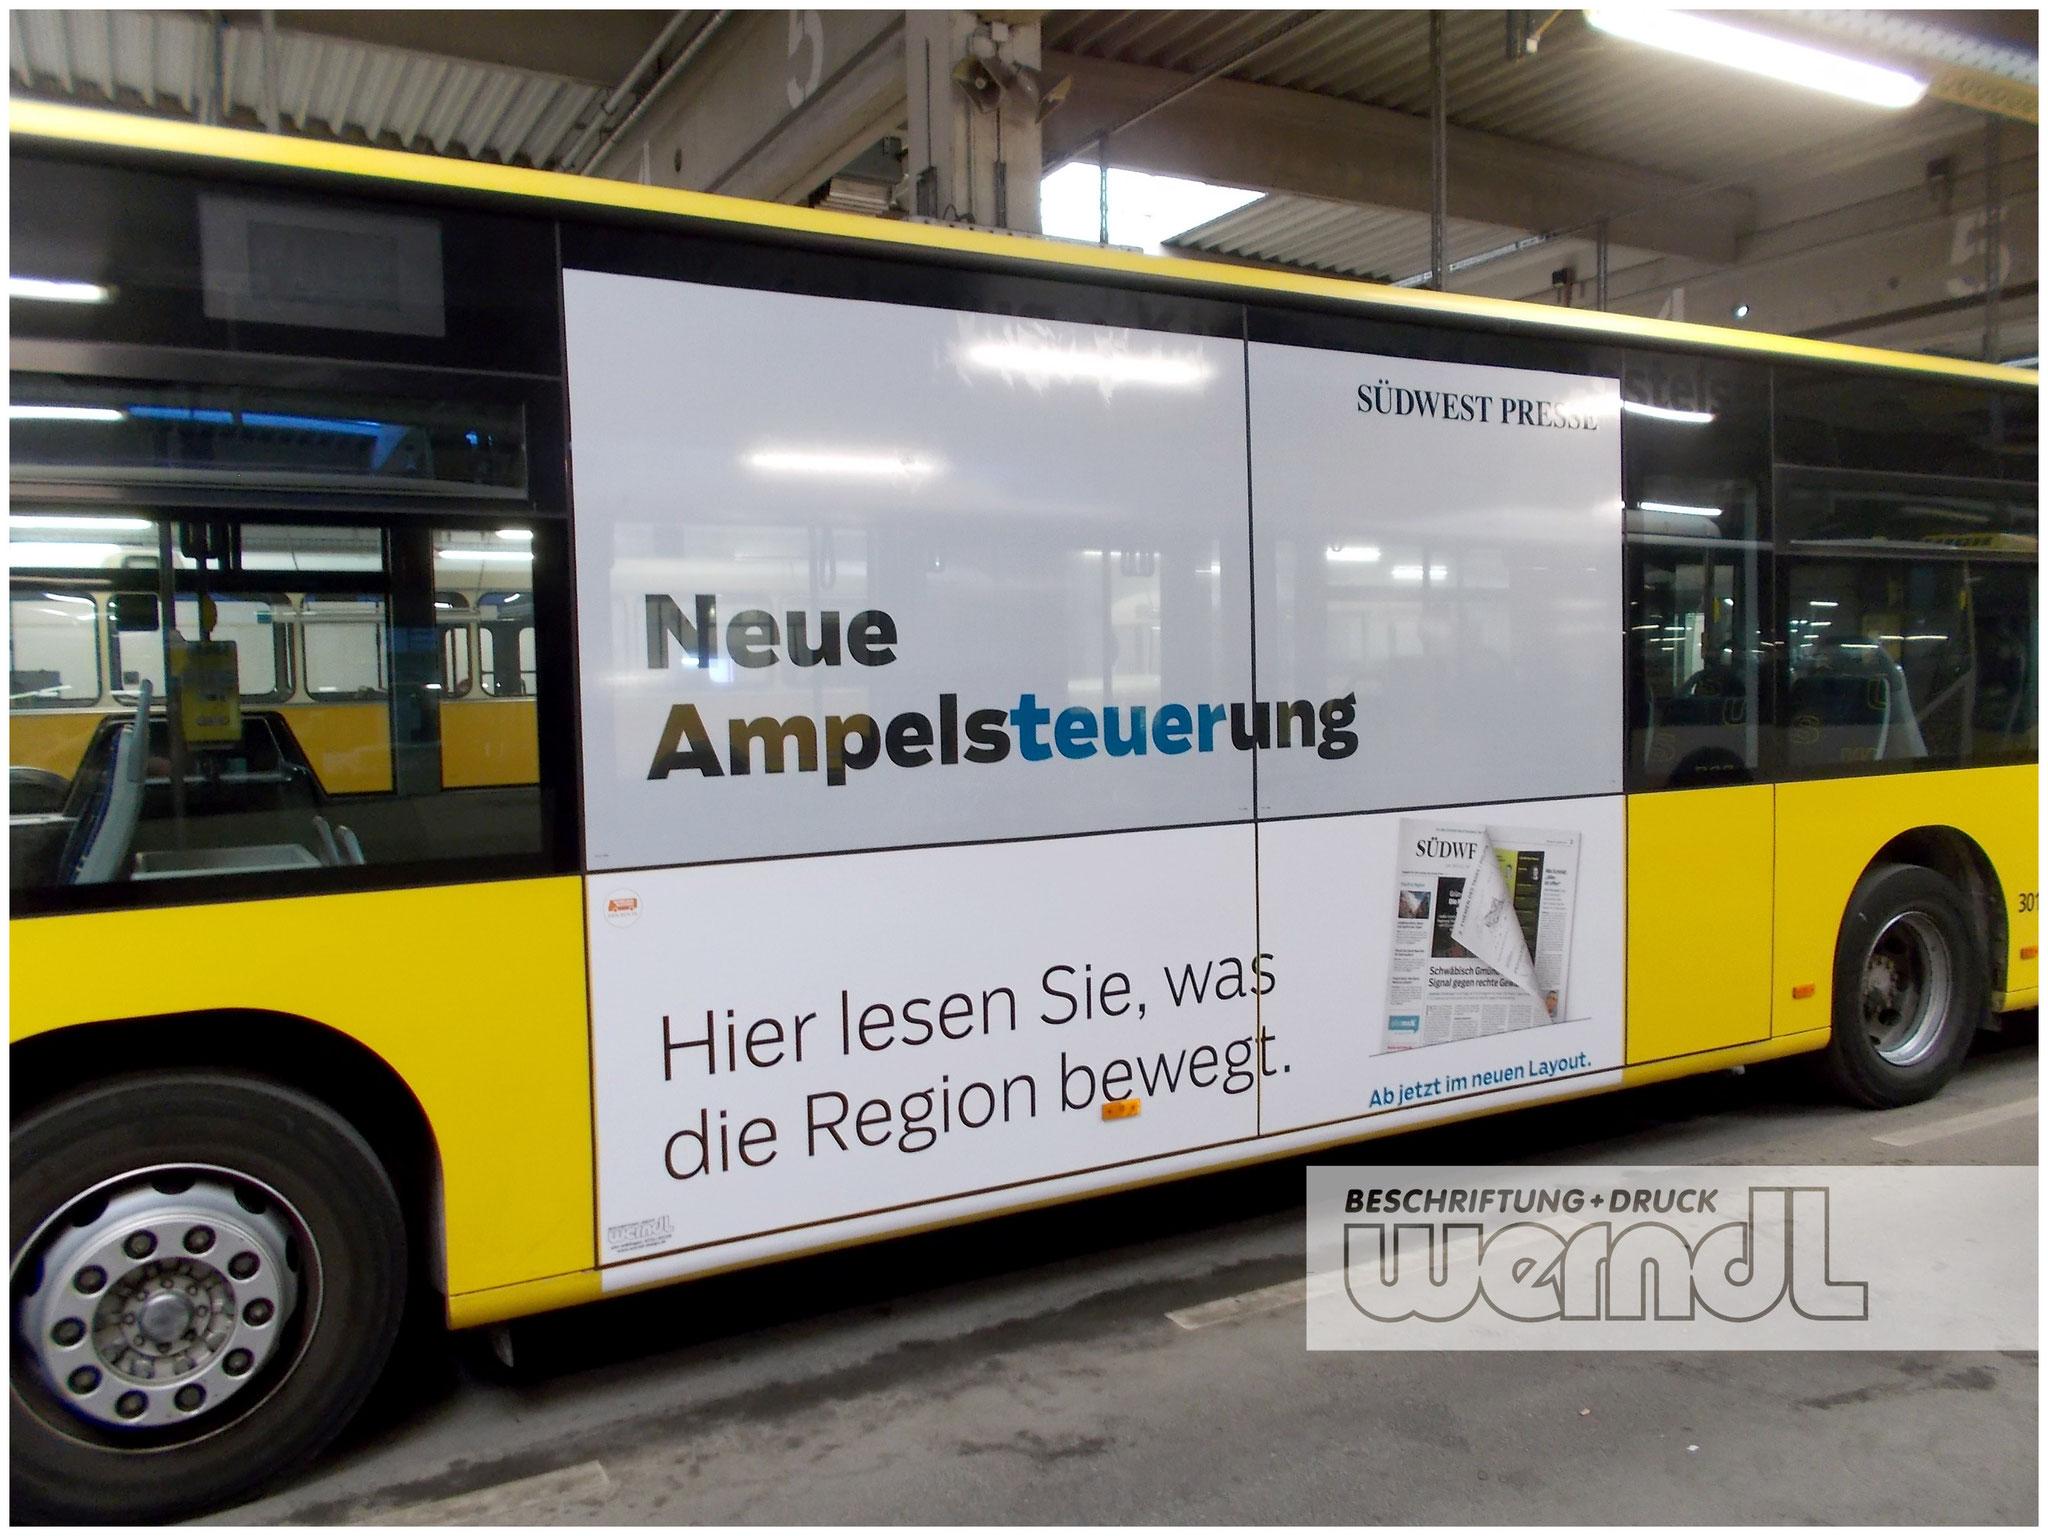 Stadtbus Trafficboard Teilfolierung